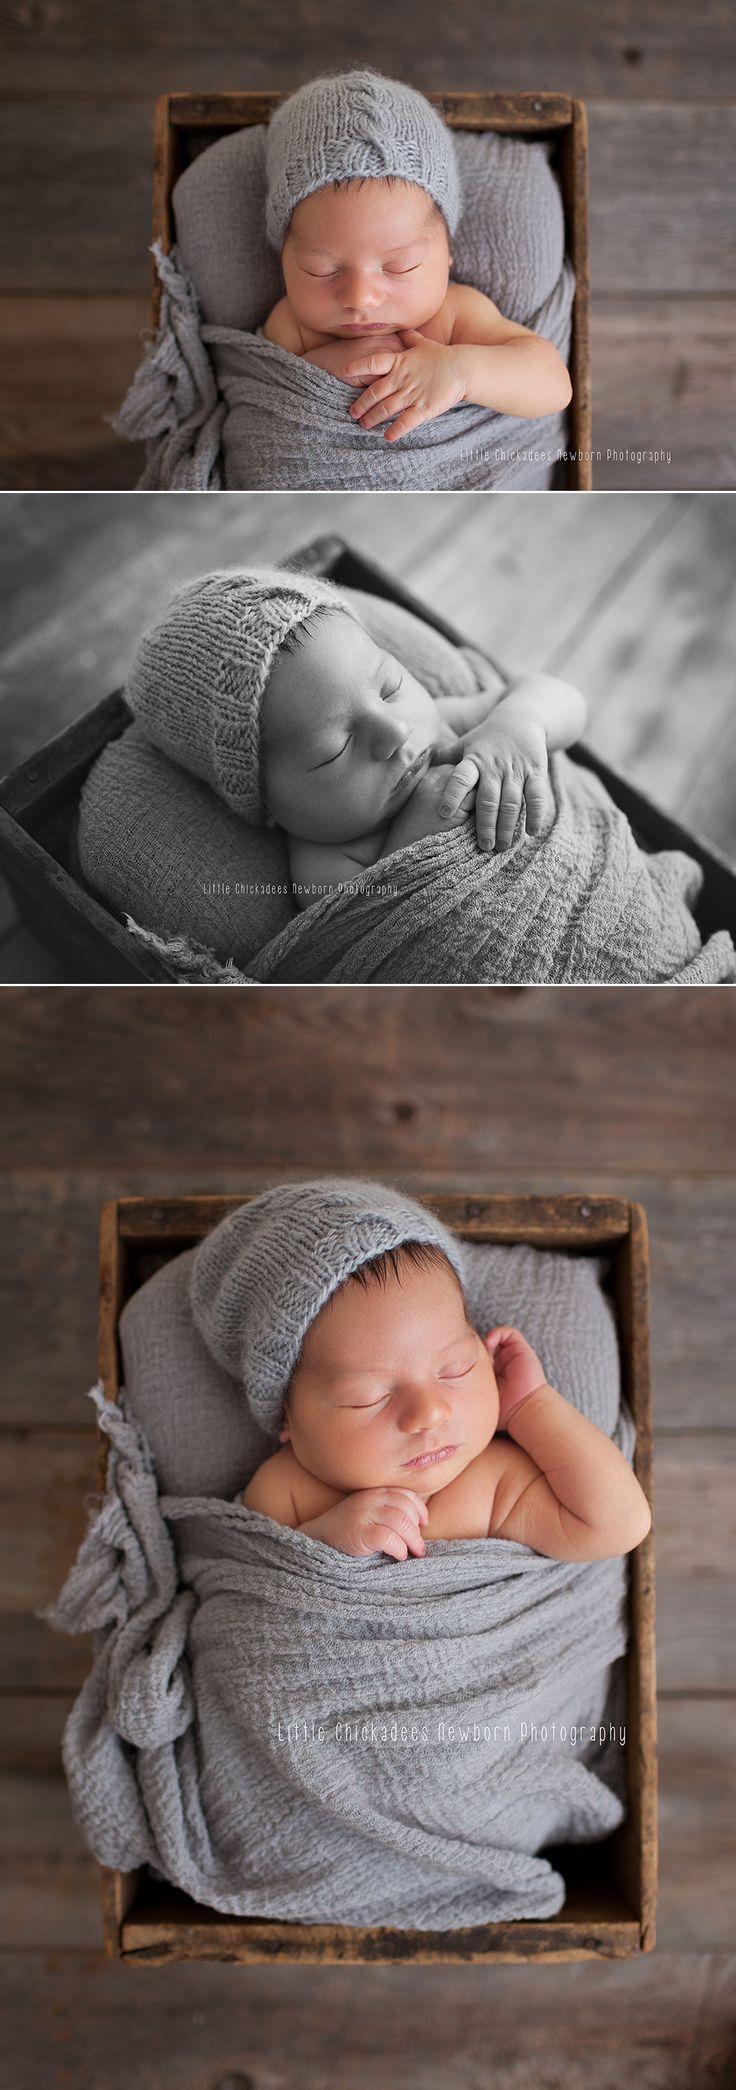 Newborn in a crate, newborn posing, North Vancouver newborn photographer, Little Chickadees Newborn Photography